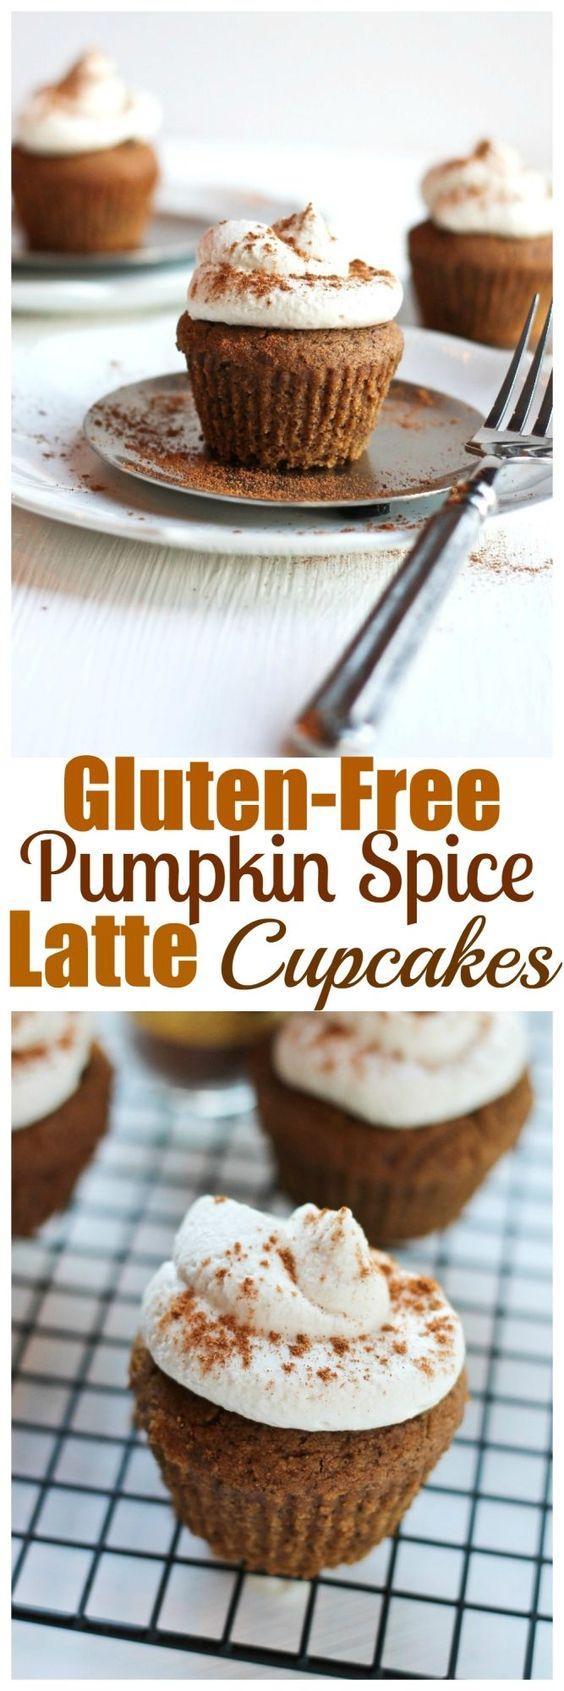 Pumpkin spice latte, Pumpkin spice and Latte on Pinterest